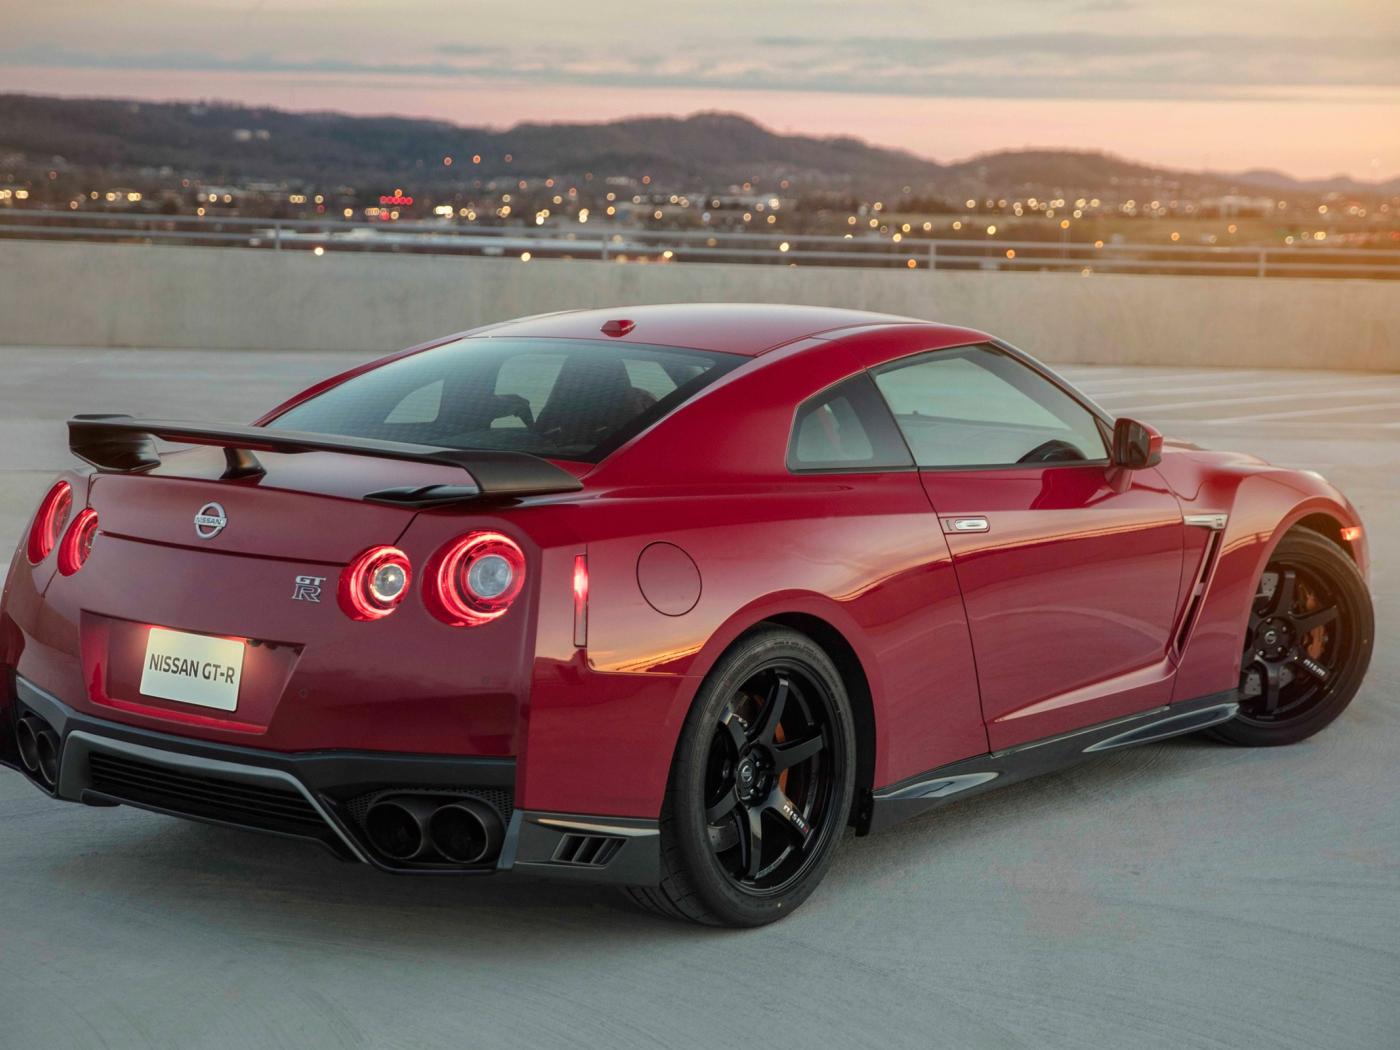 1400x1050 wallpaper Nissan GT-R, rear view, red car